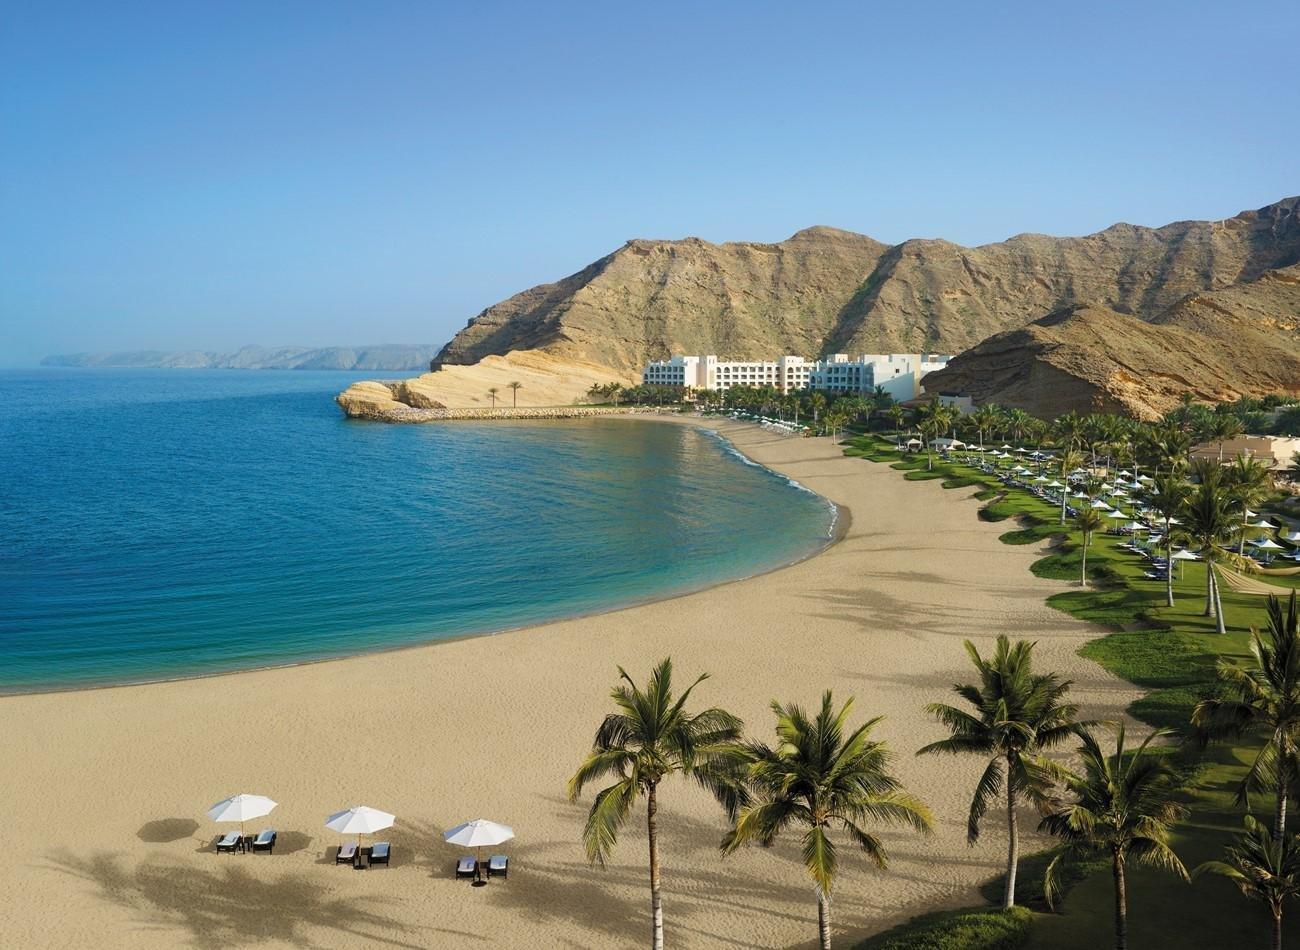 Hotel Shangri-La Al Bandar strand - Muscat